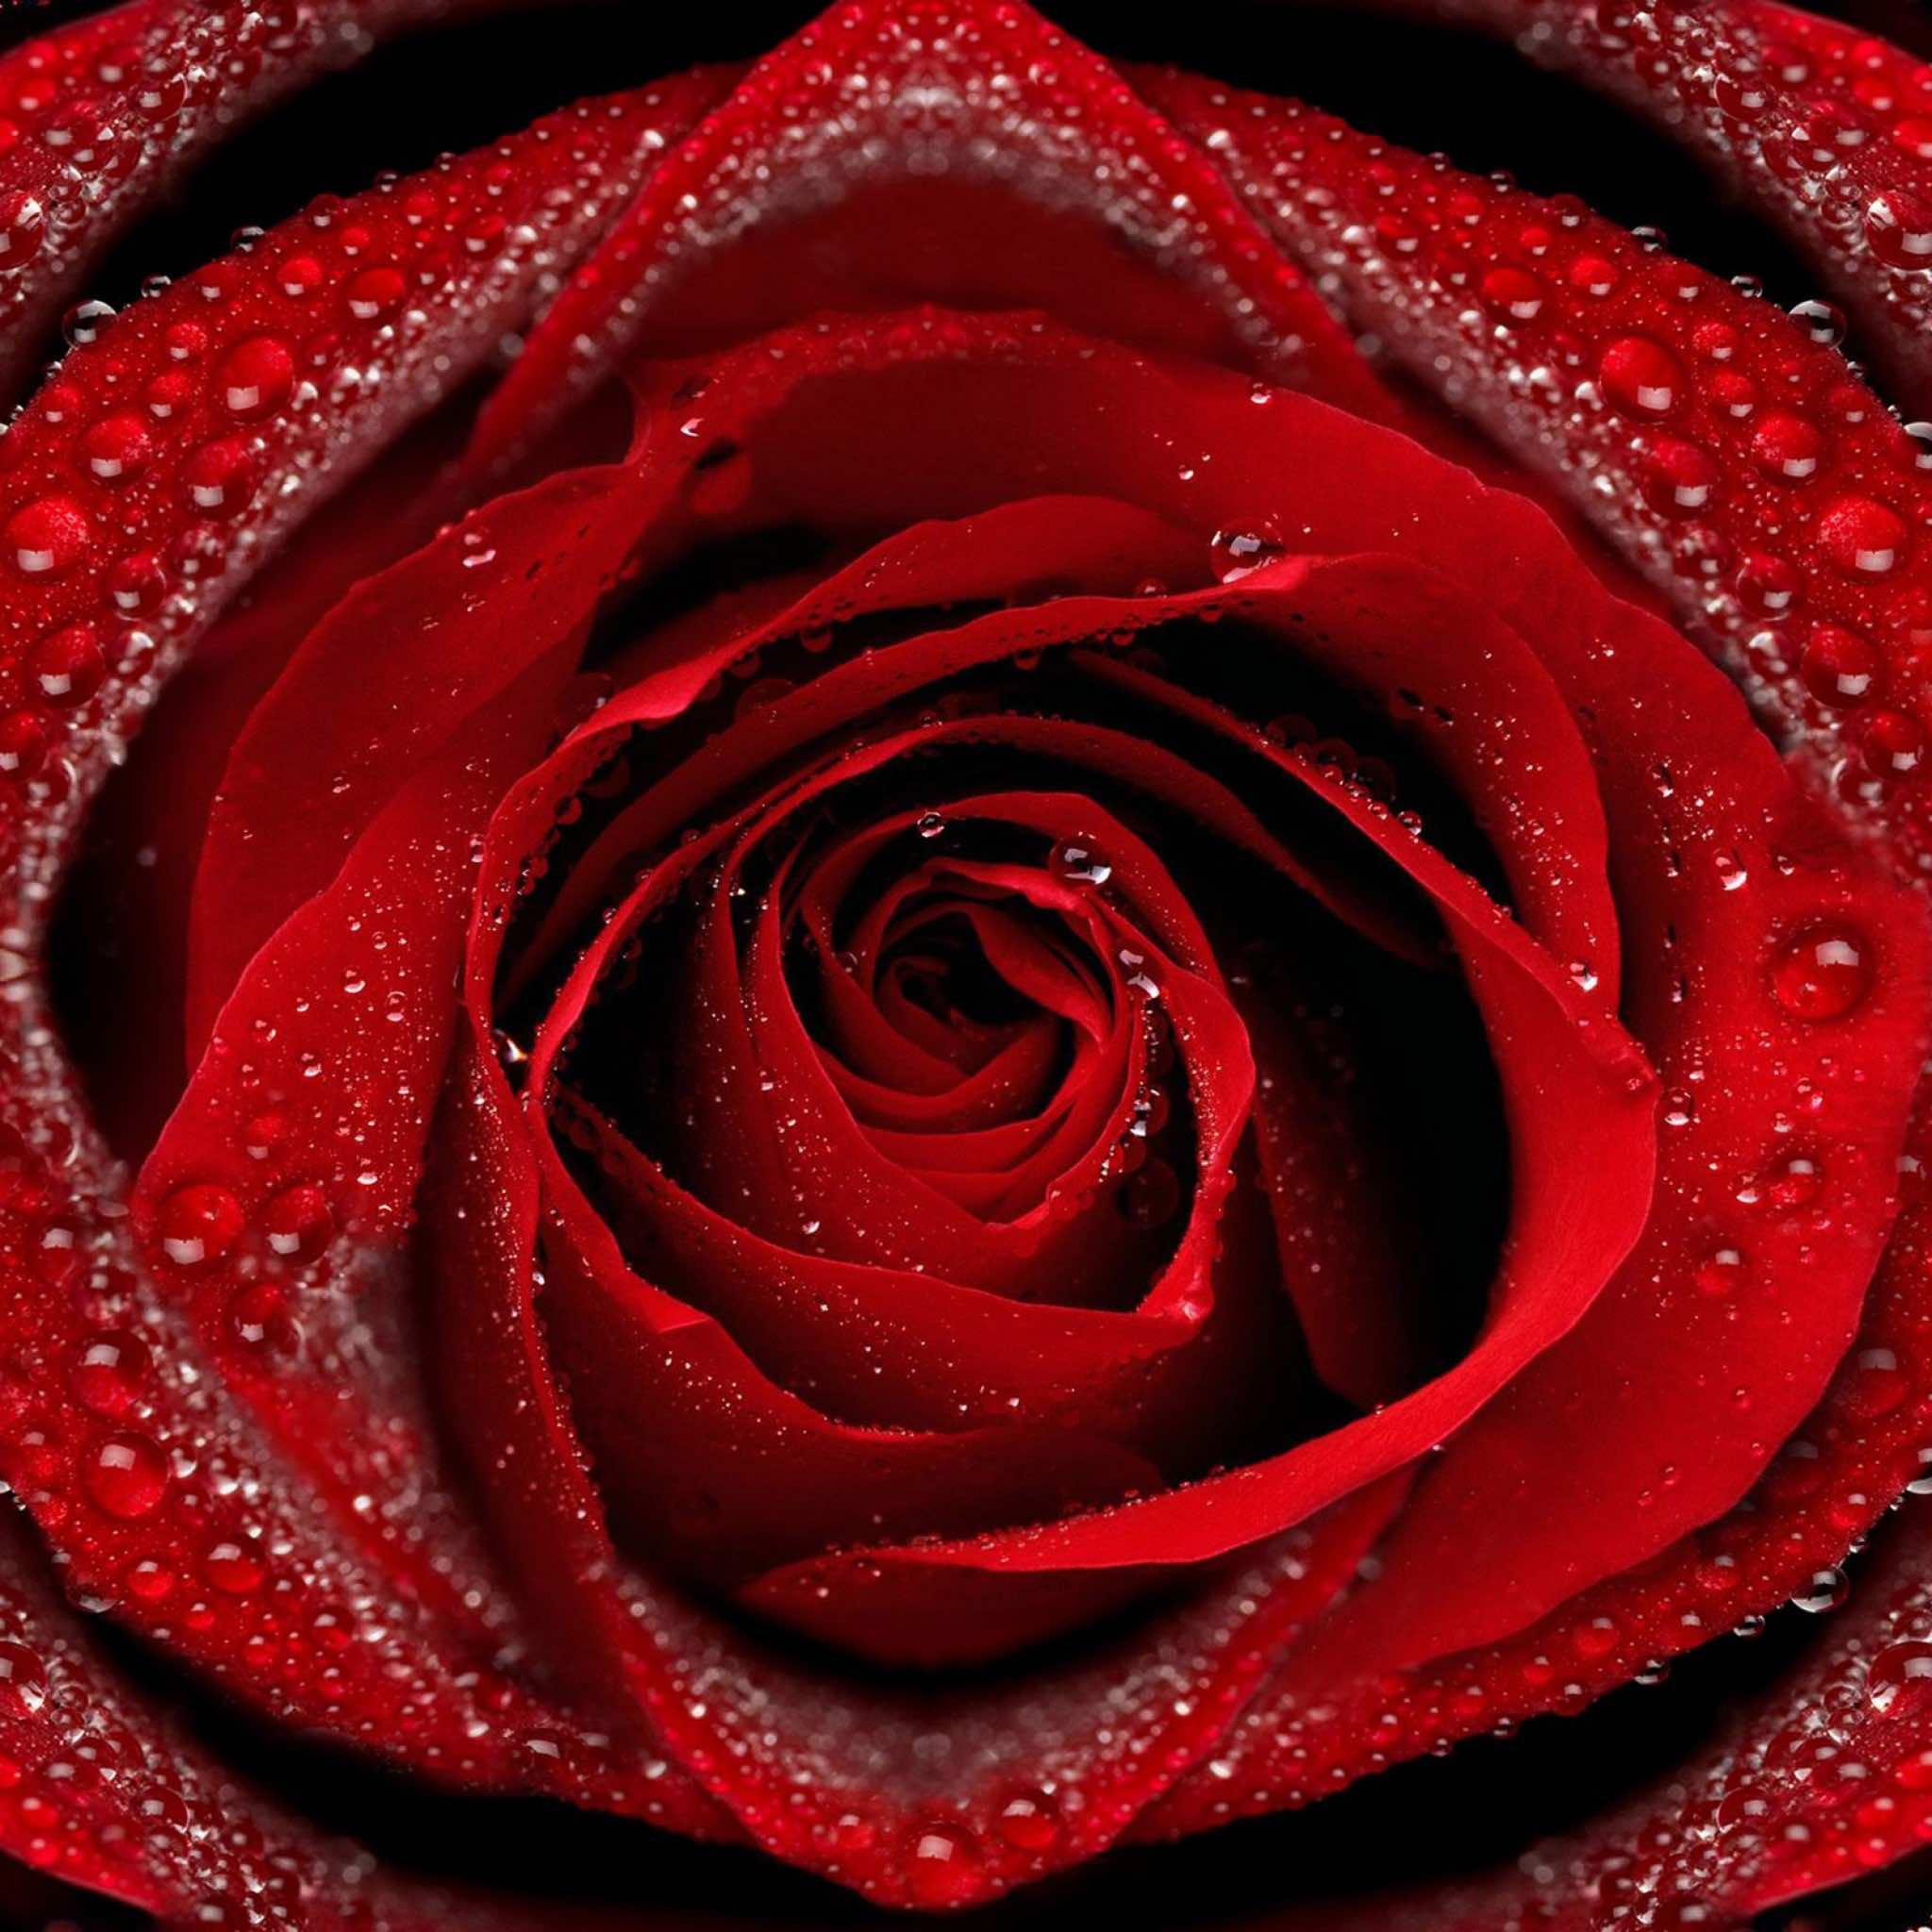 Water Falling Live Wallpaper Download 74 Rose Wallpaper For Hd Download